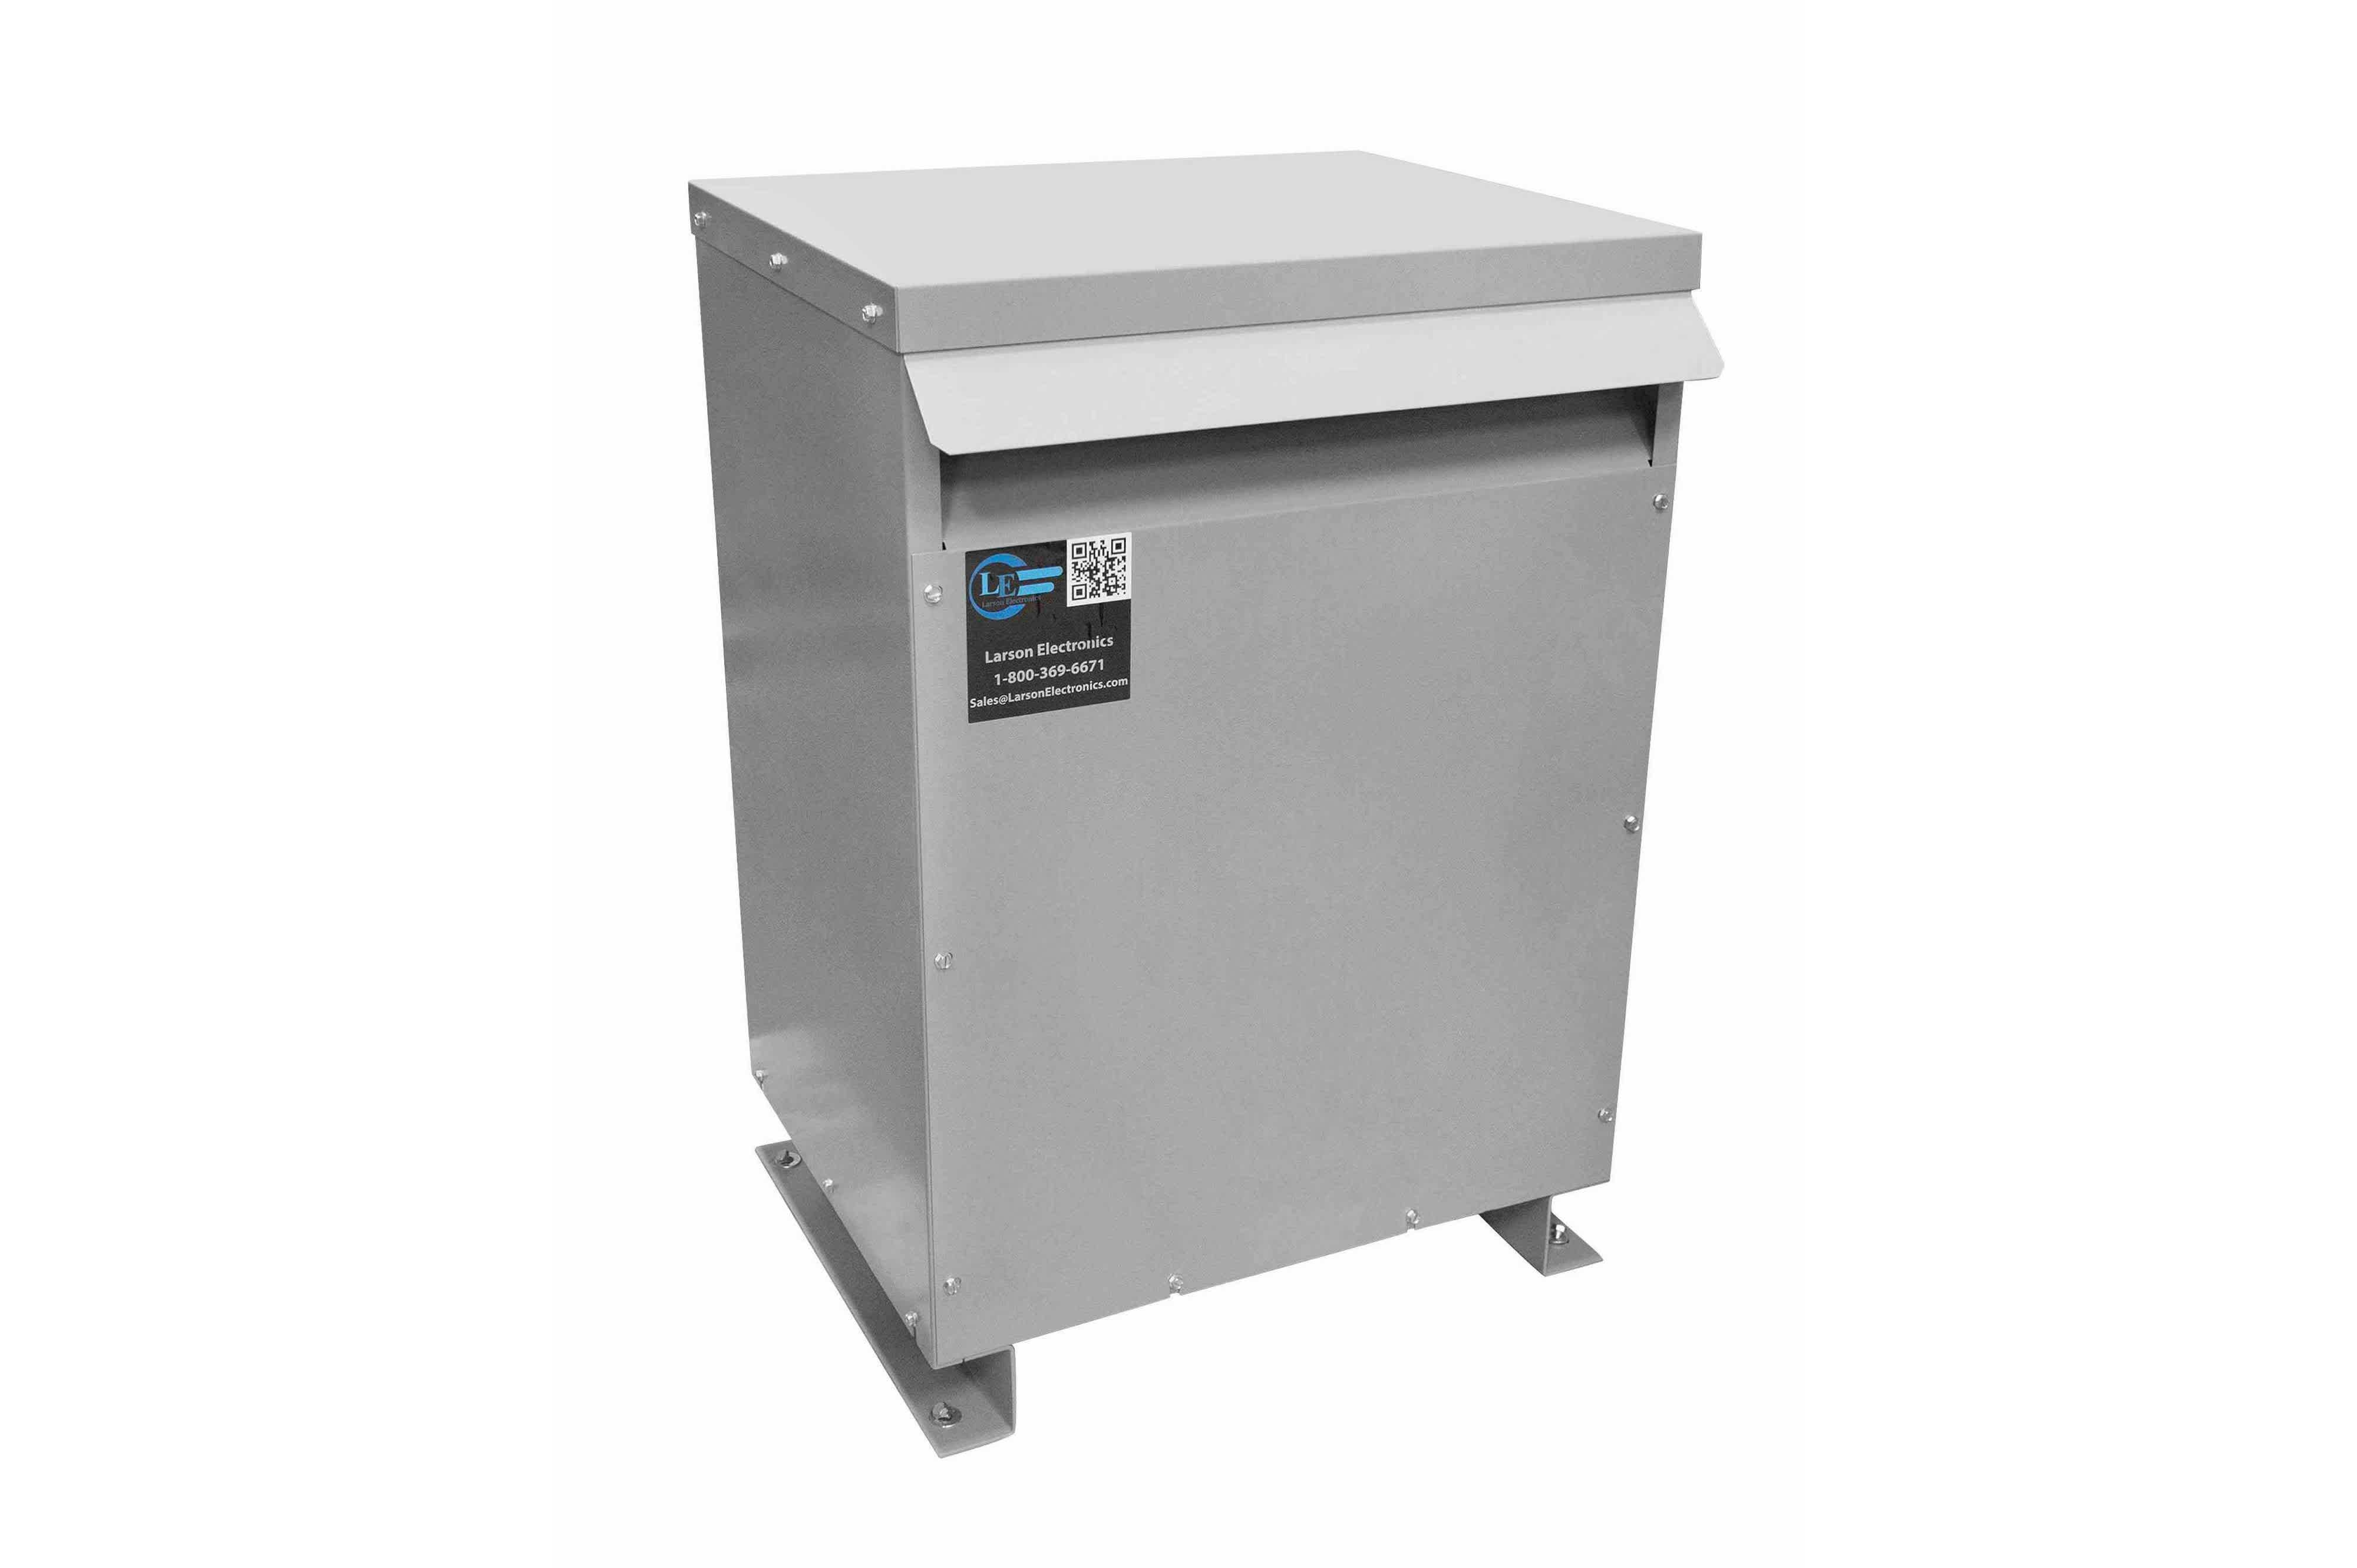 110 kVA 3PH Isolation Transformer, 220V Wye Primary, 480V Delta Secondary, N3R, Ventilated, 60 Hz